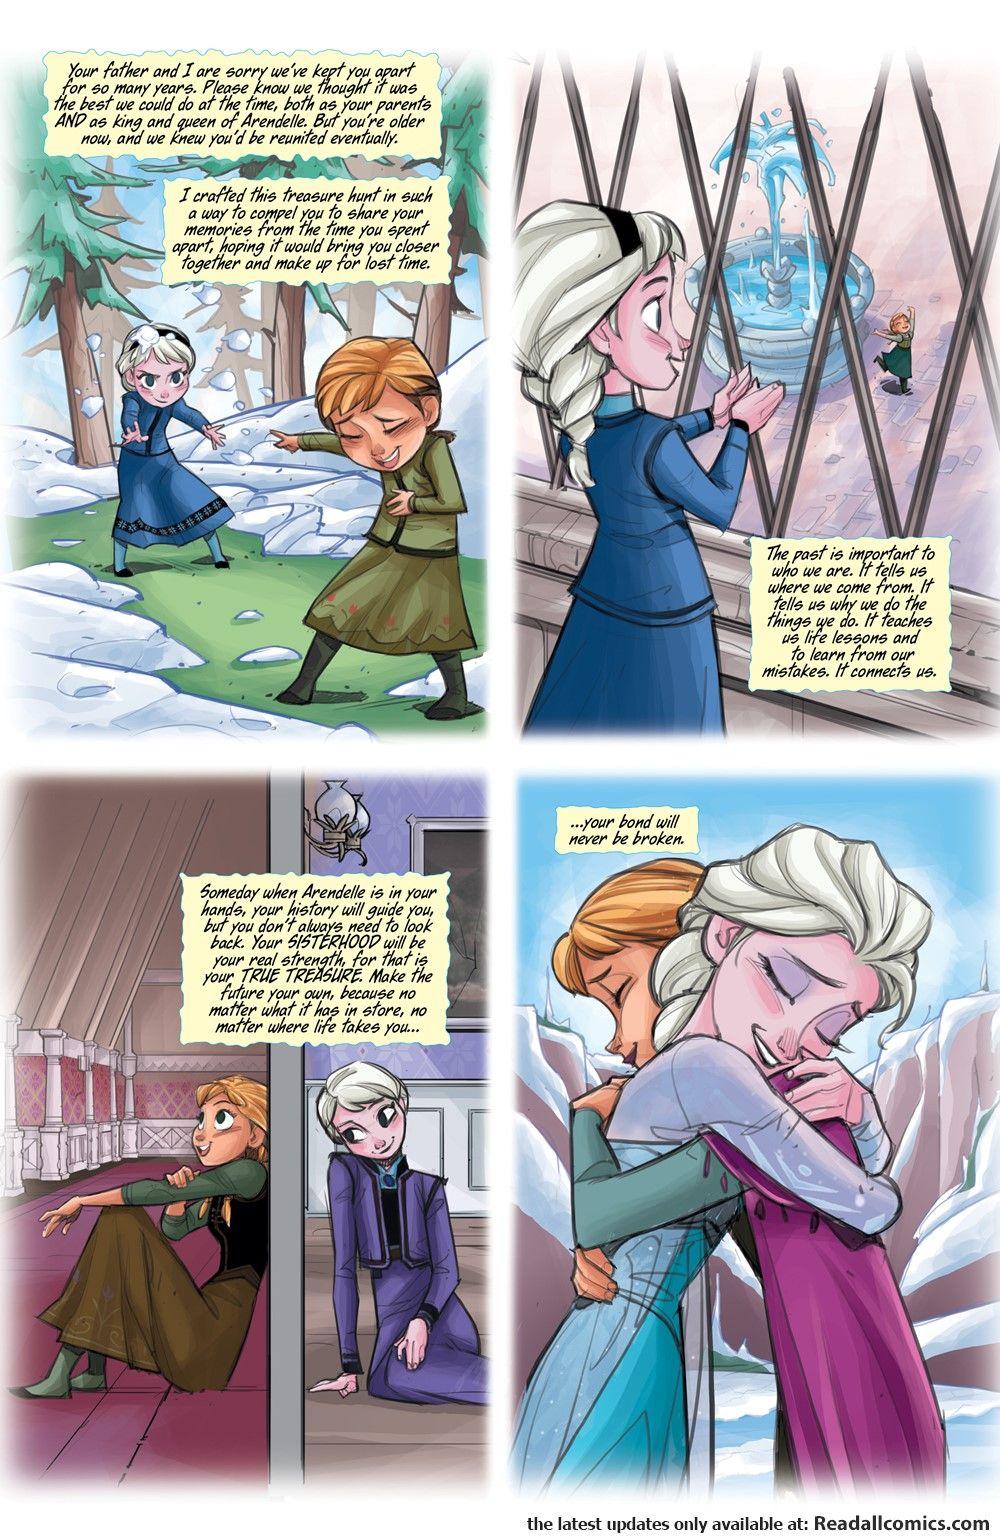 Frozen True Treasure 003 2020 | Read Frozen True Treasure 003 2020 comic online in high quality. Read Full Comic online for free - Read comics online in high quality .